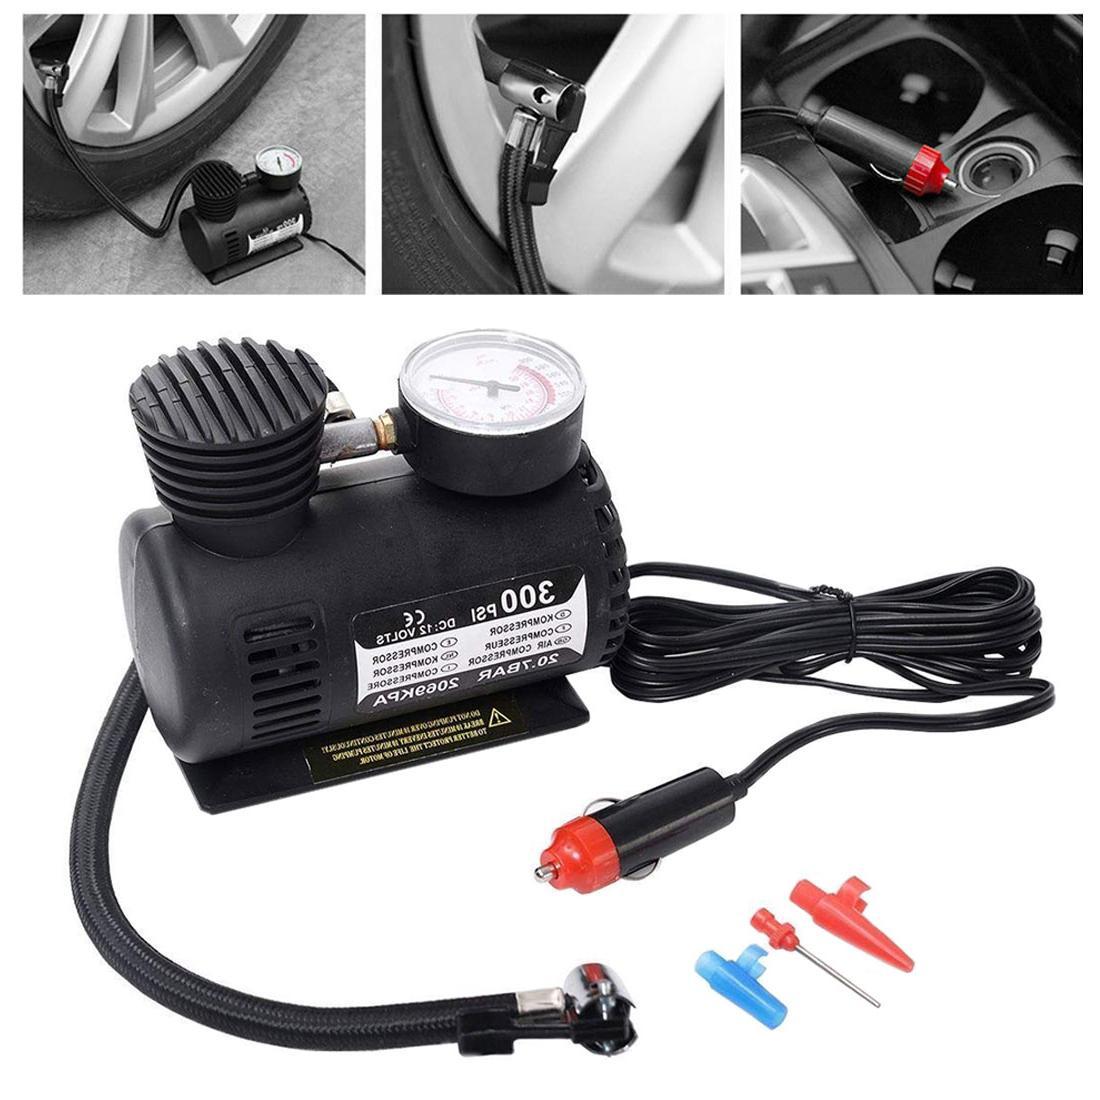 Car Vehicle <font><b>Air</b></font> 300 Pump Parts Universal